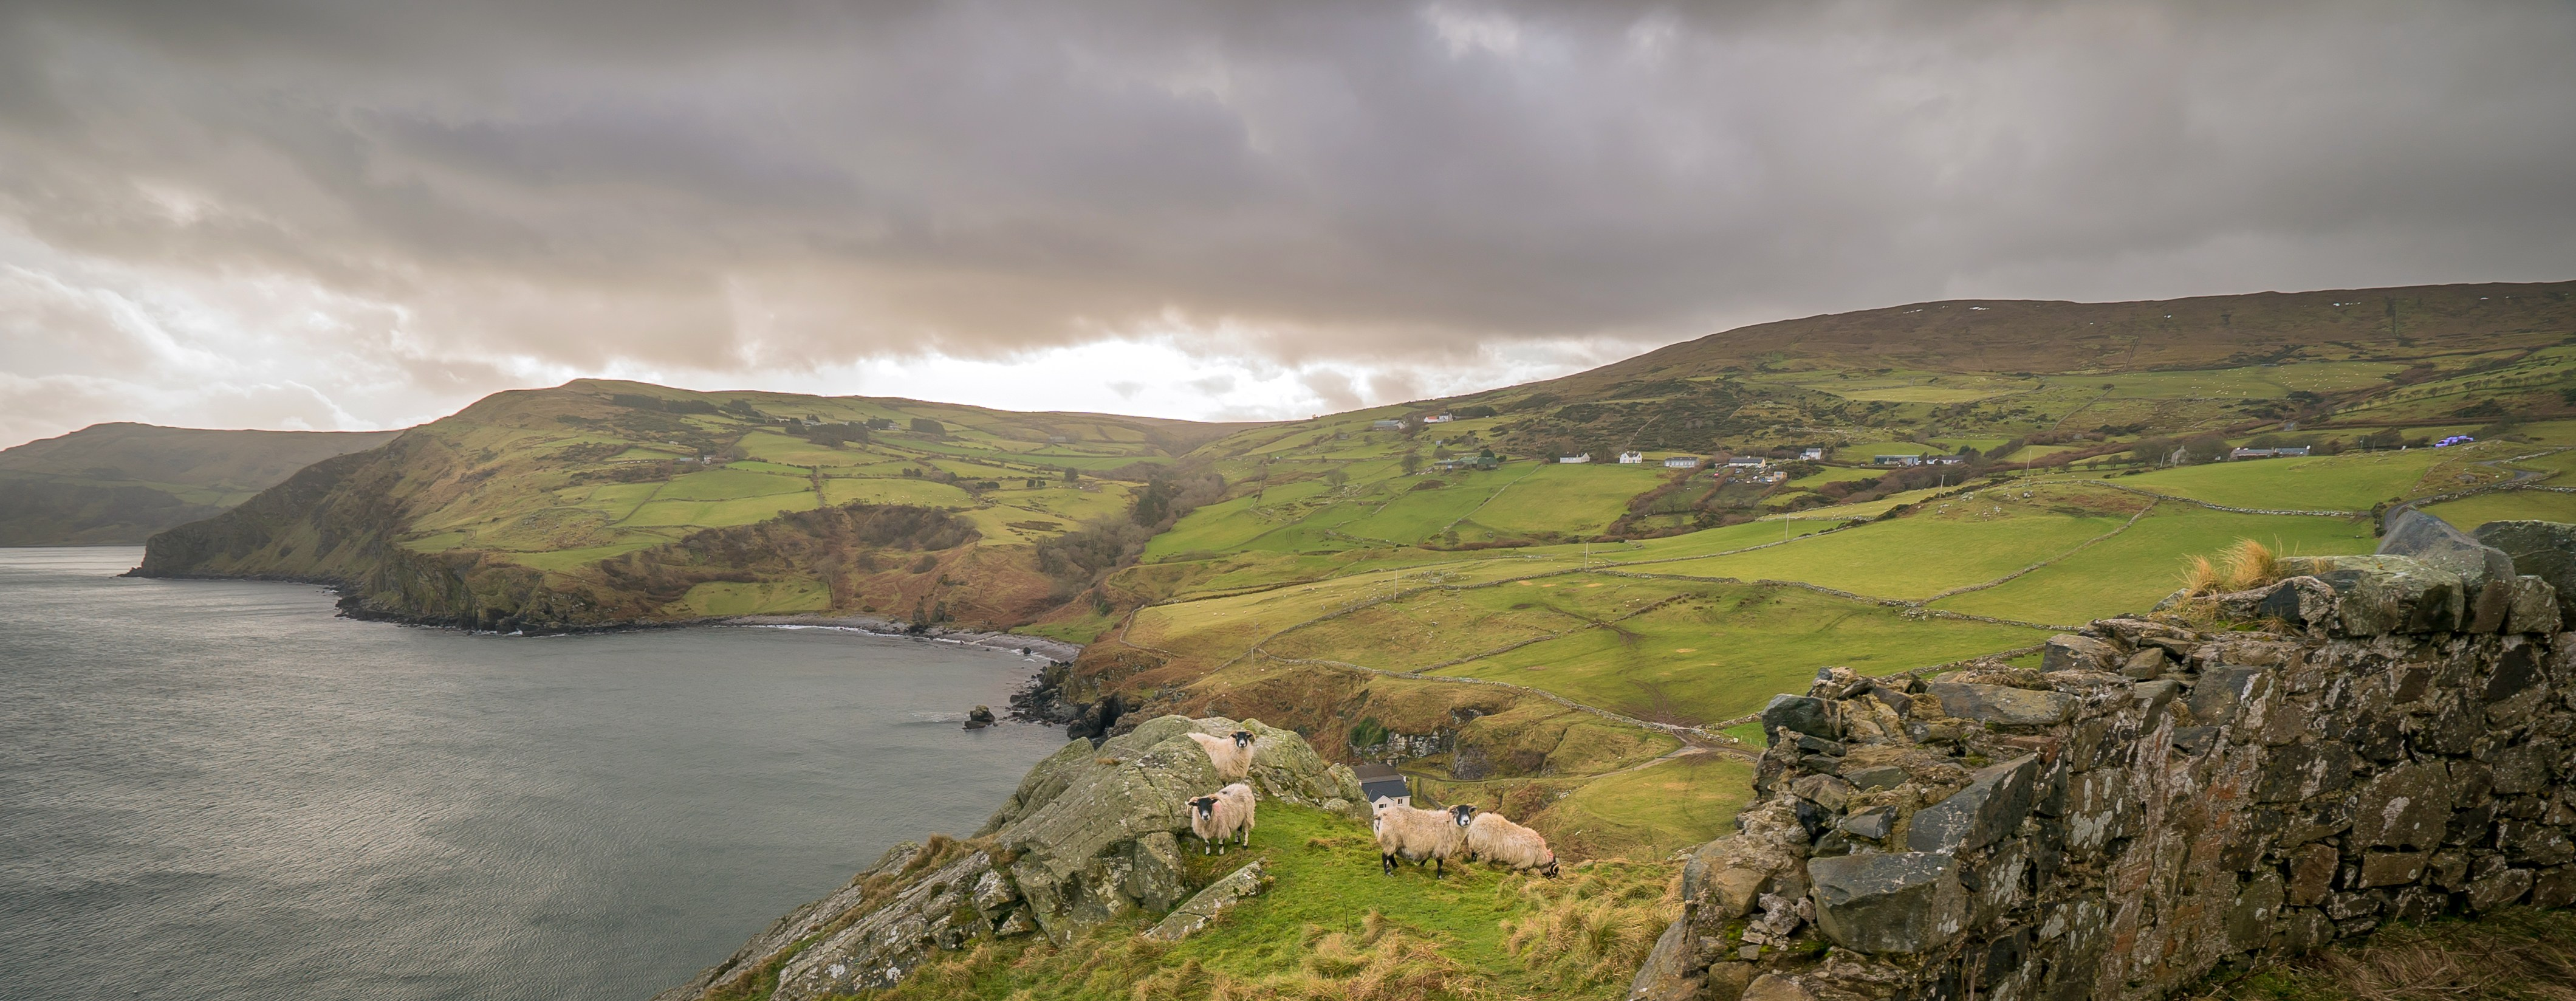 Sheep-at-Torr-Head